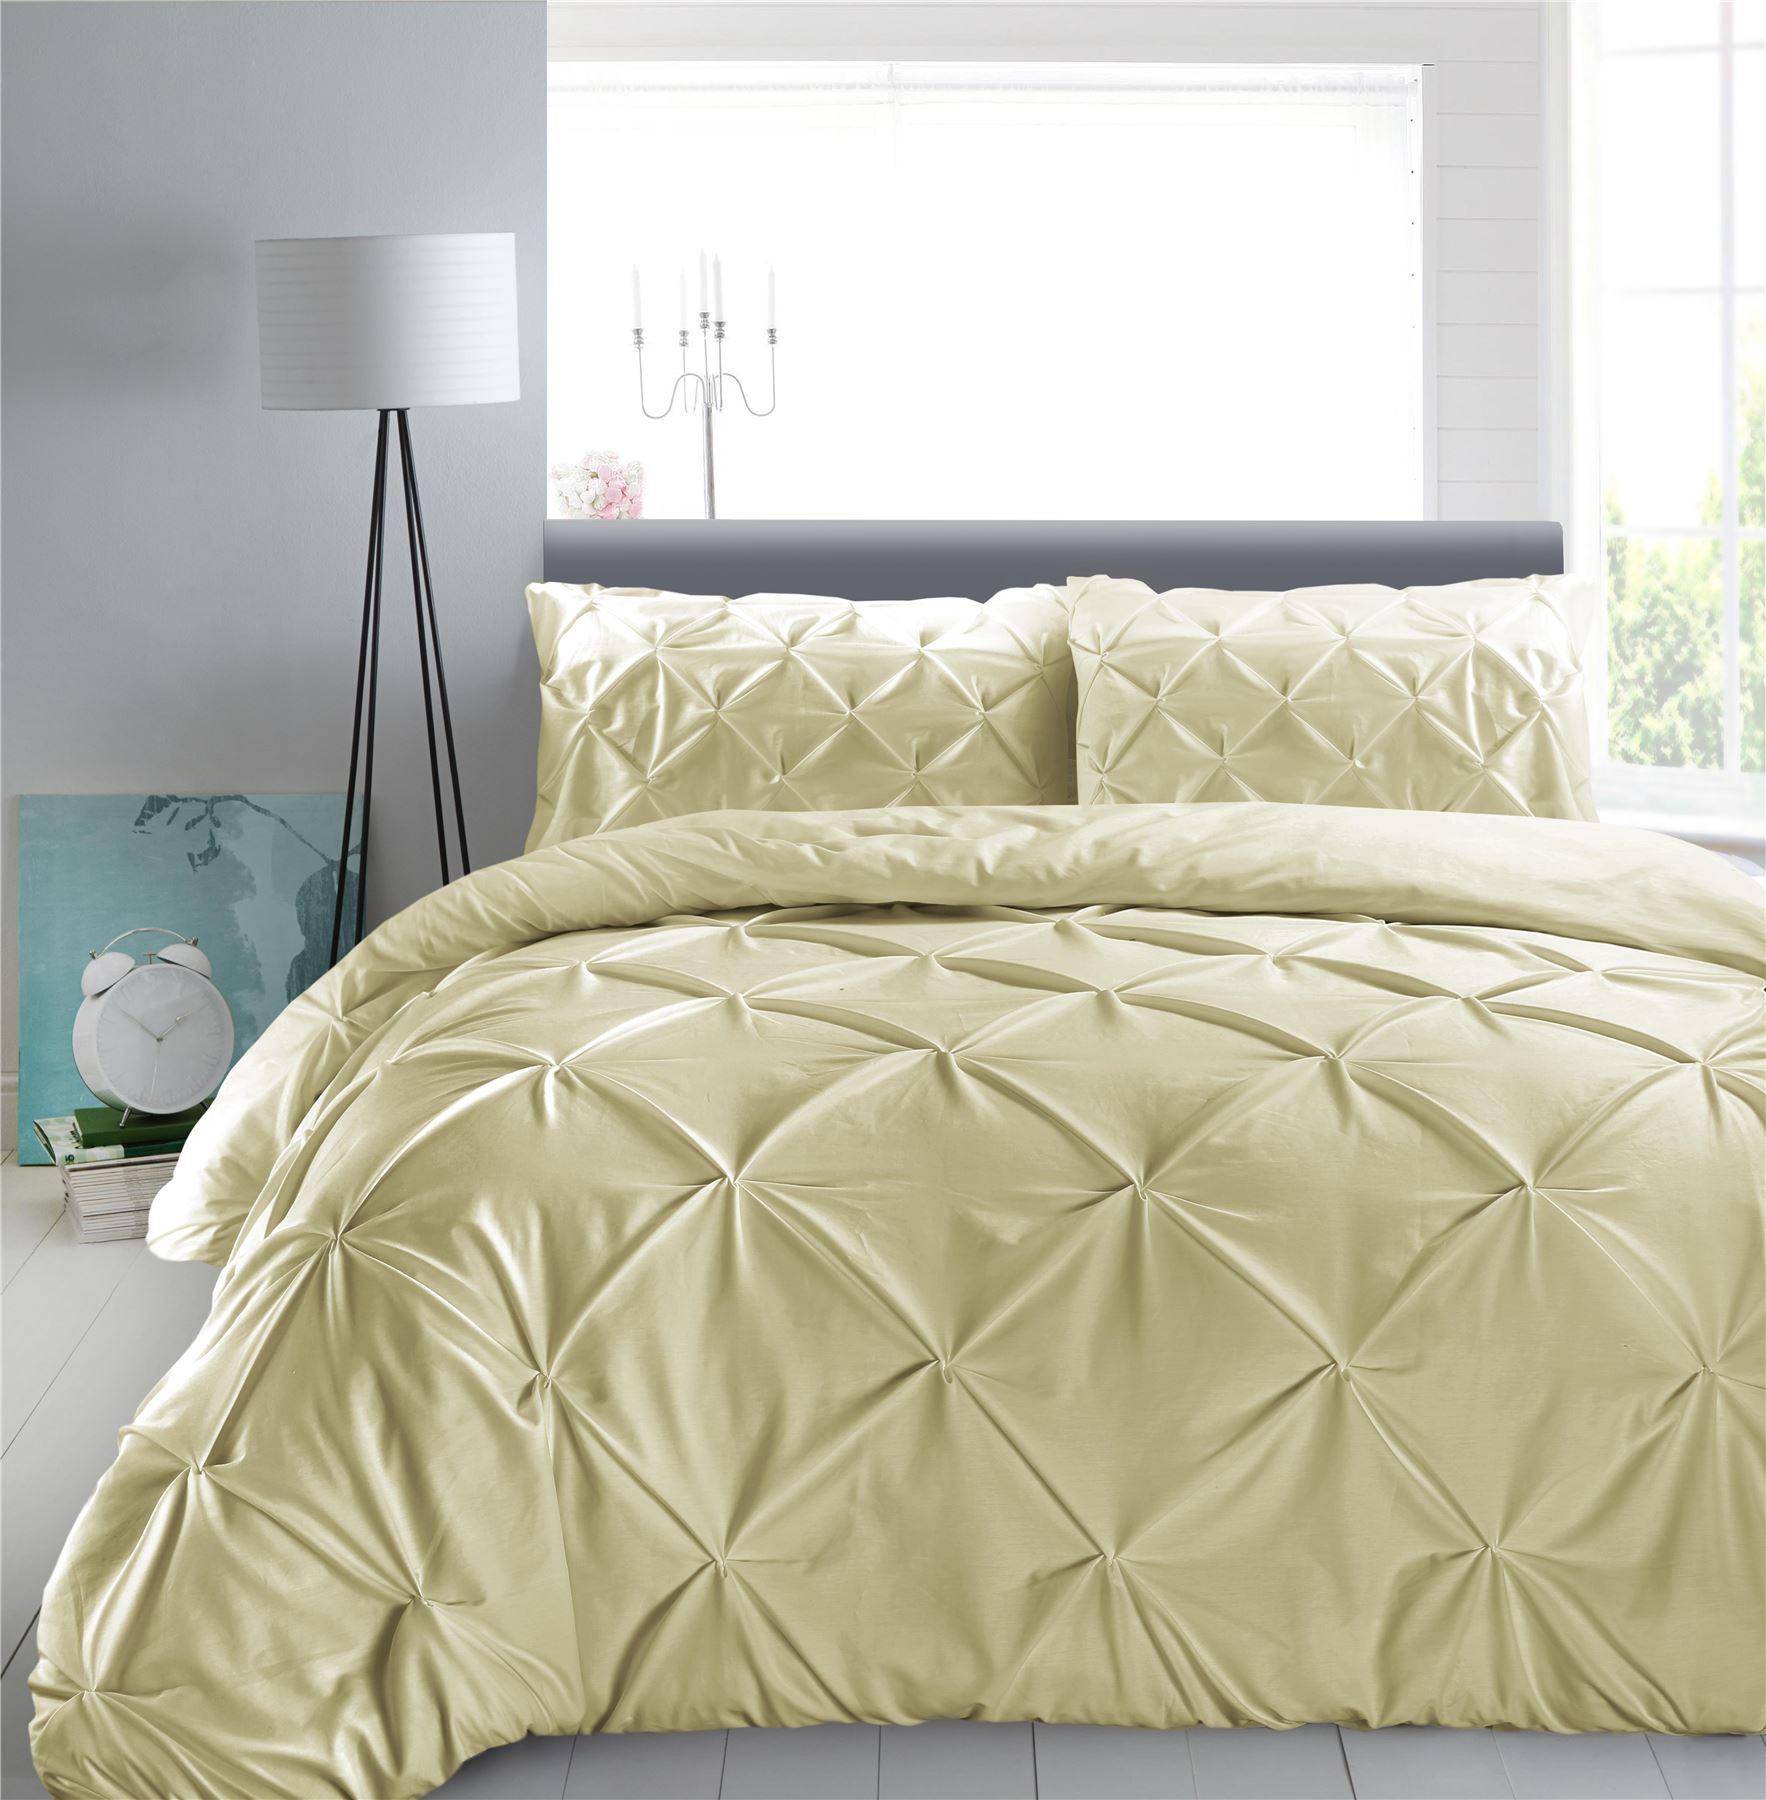 Luxury-Pure-100-Cotton-200-Thread-Pinch-Pleat-Pintuck-Puckering-Duvet-Cover-Set thumbnail 52